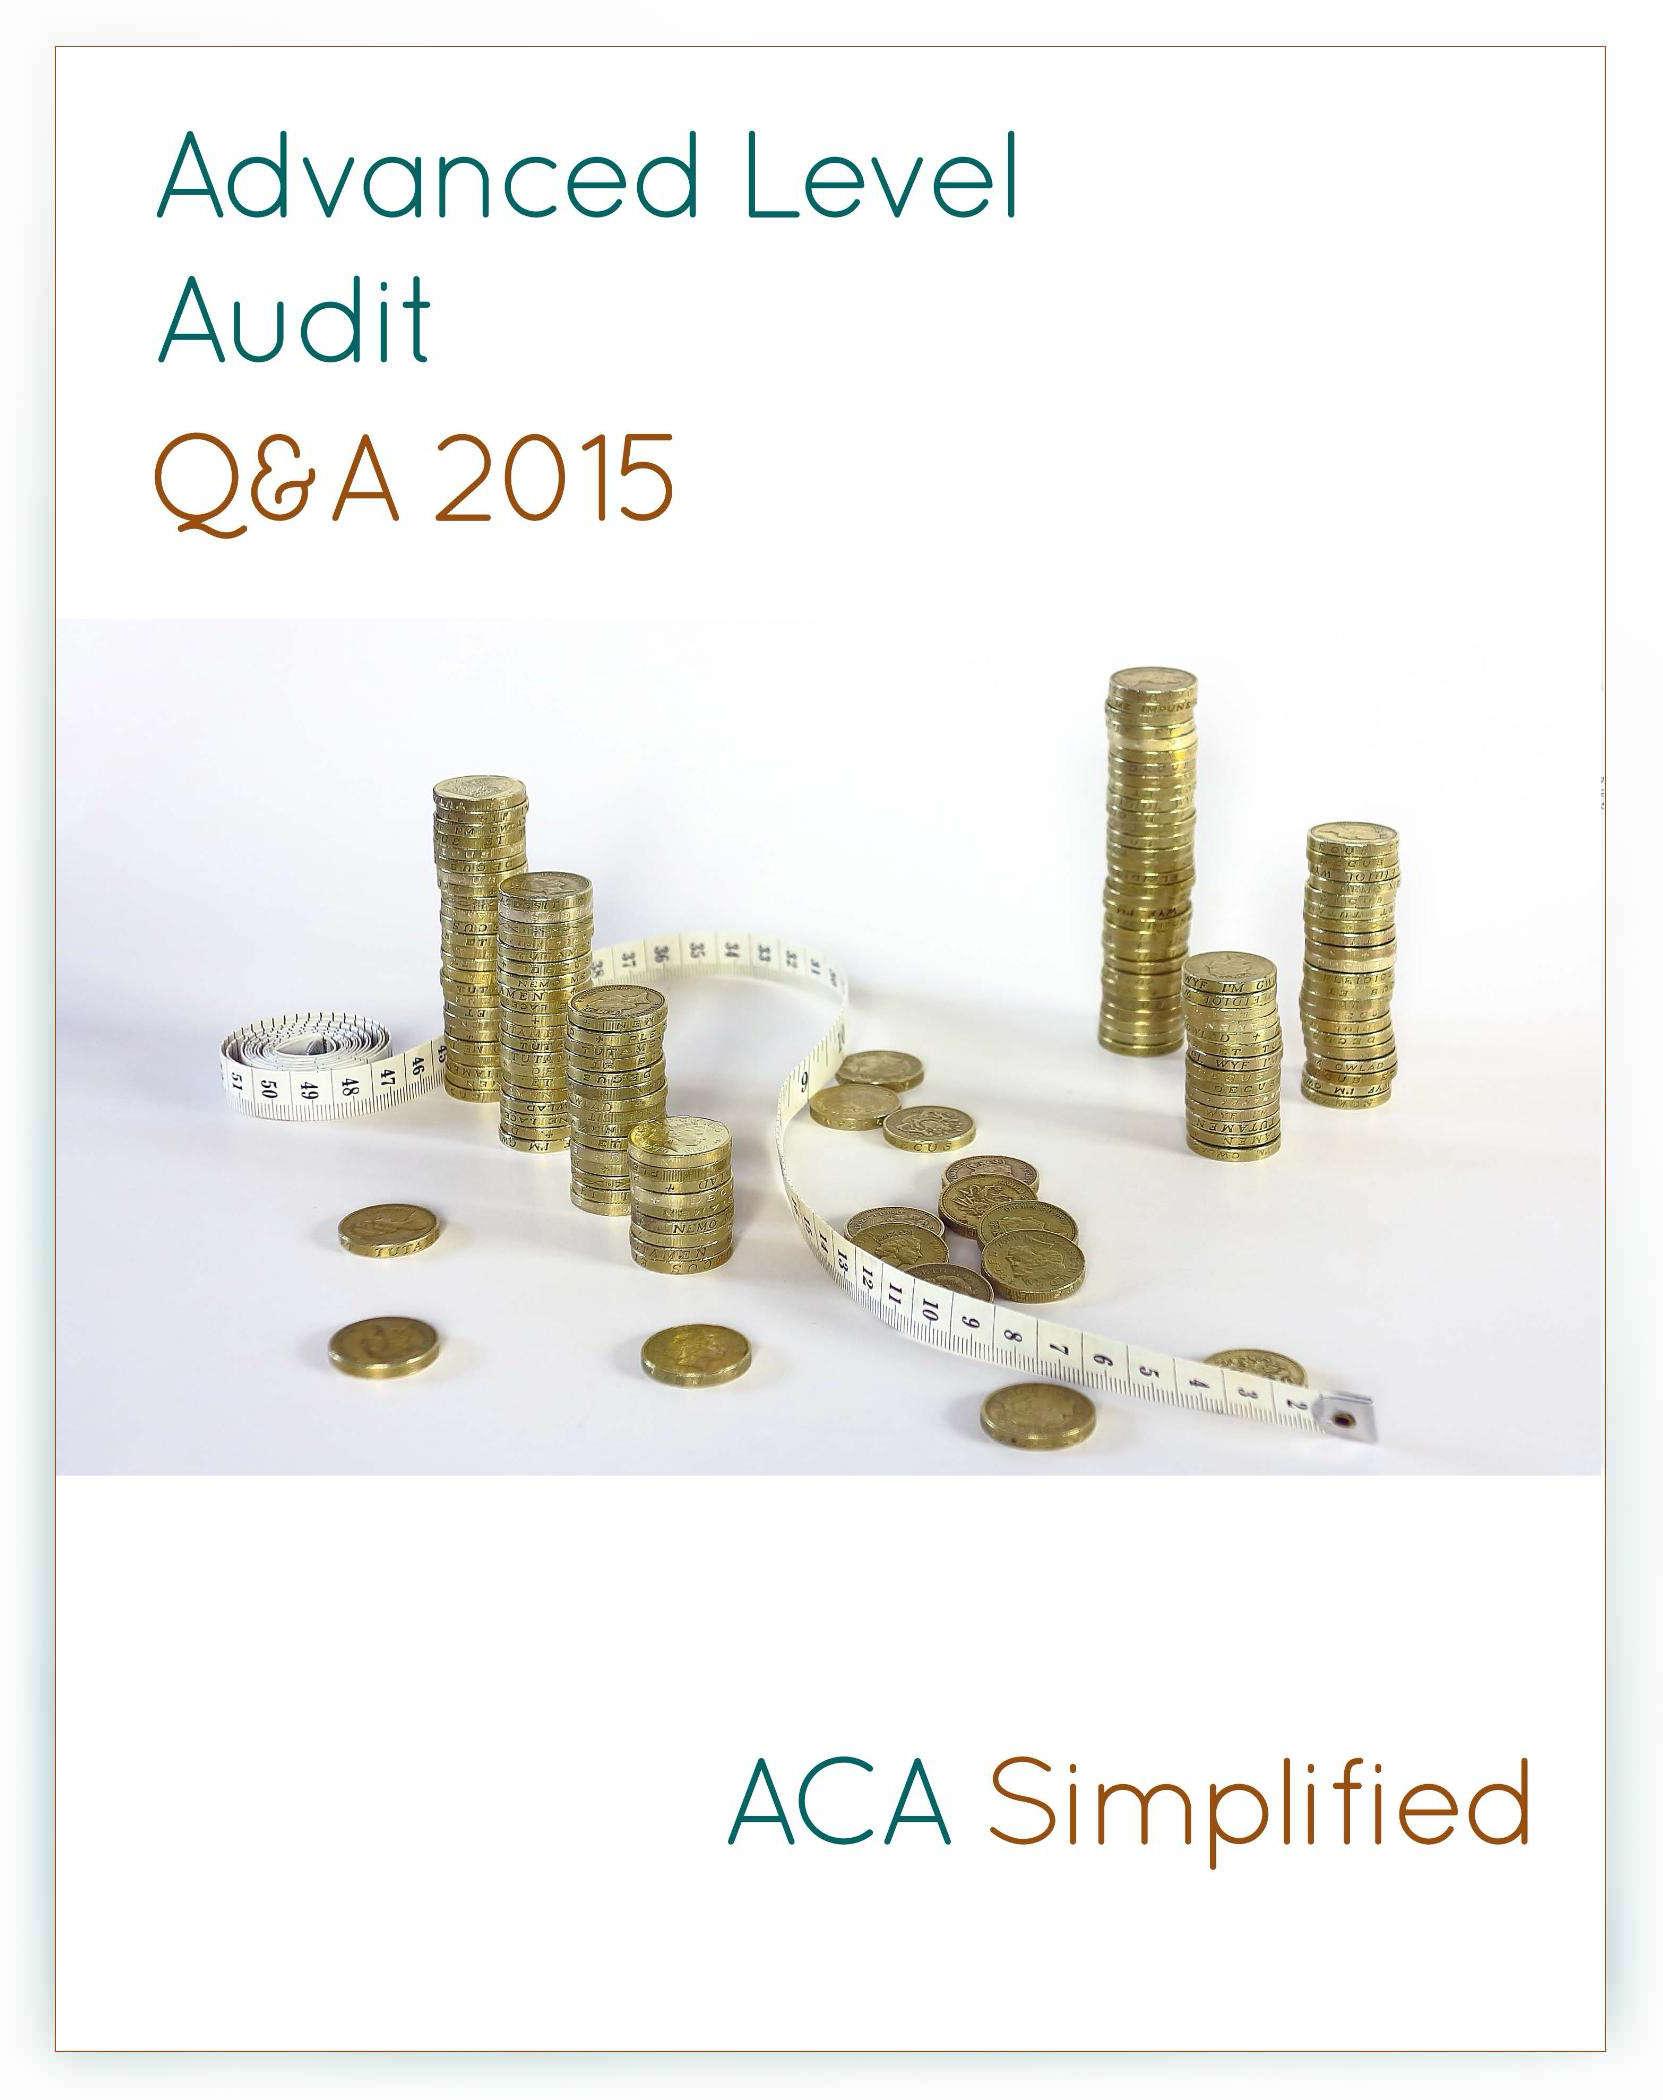 Advanced Level  ACA Simplified